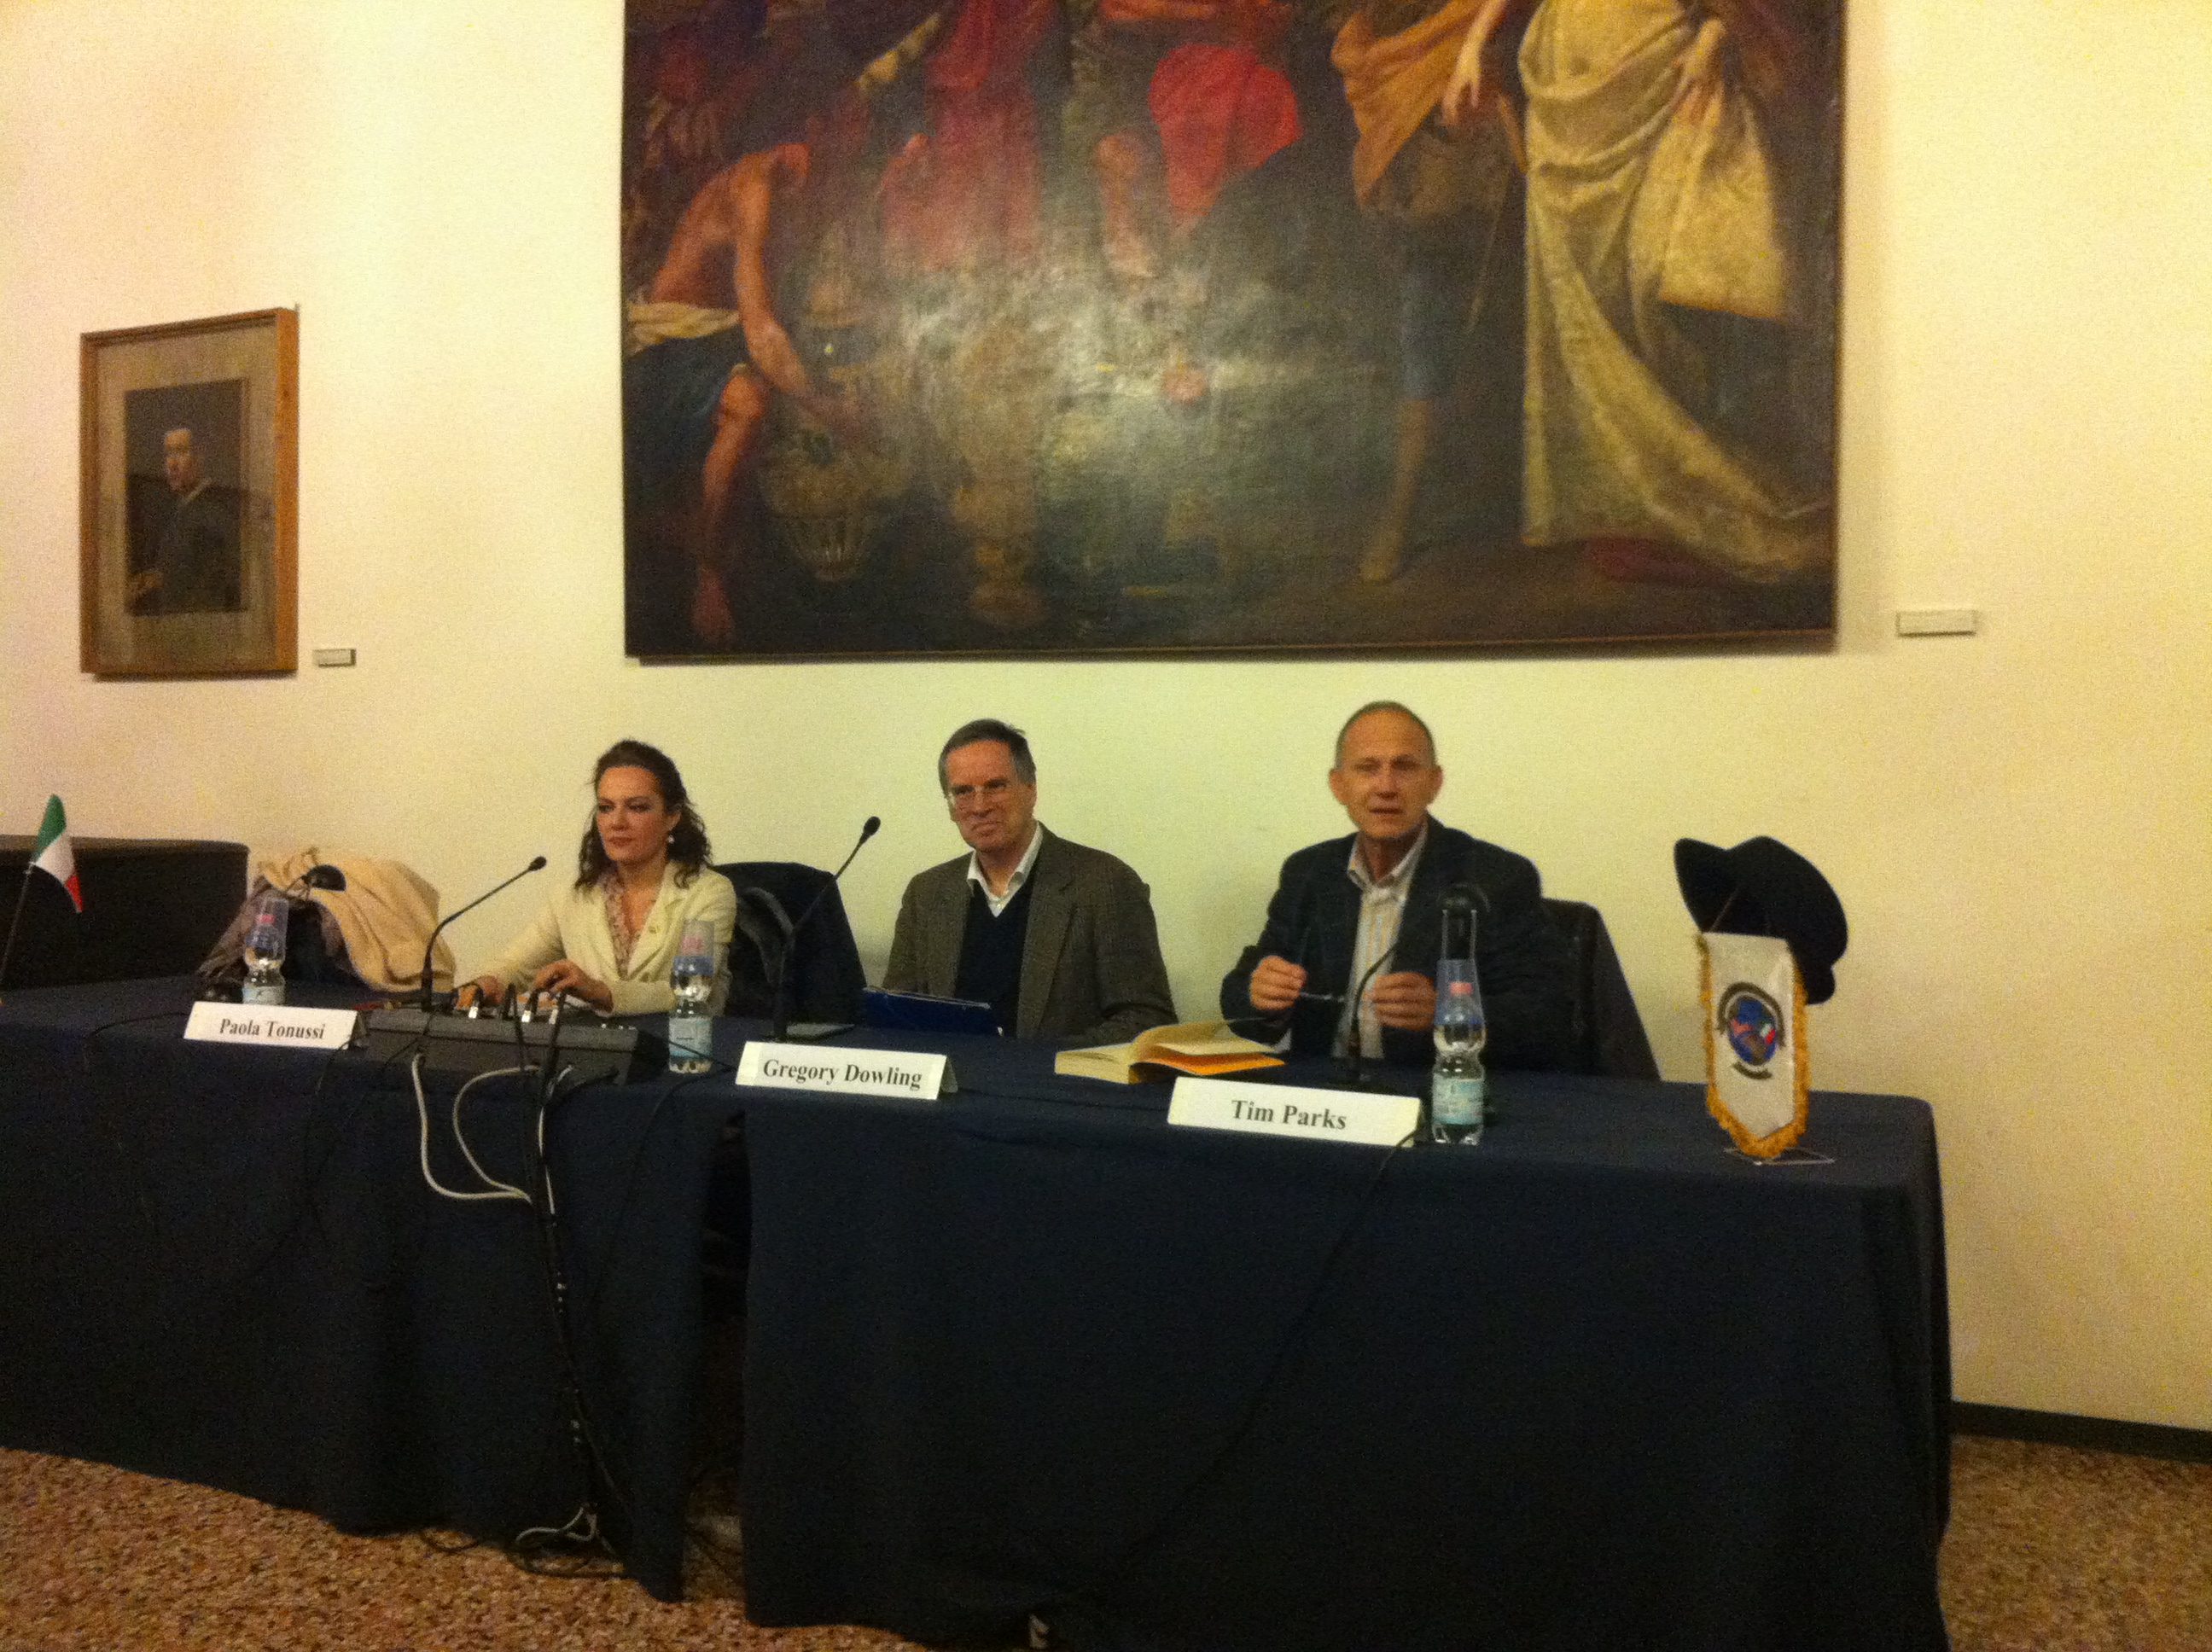 Paola_Tonussi,_Gregory_Dowling,_Tim_Parks,_Società_Letteraria_Verona_2013